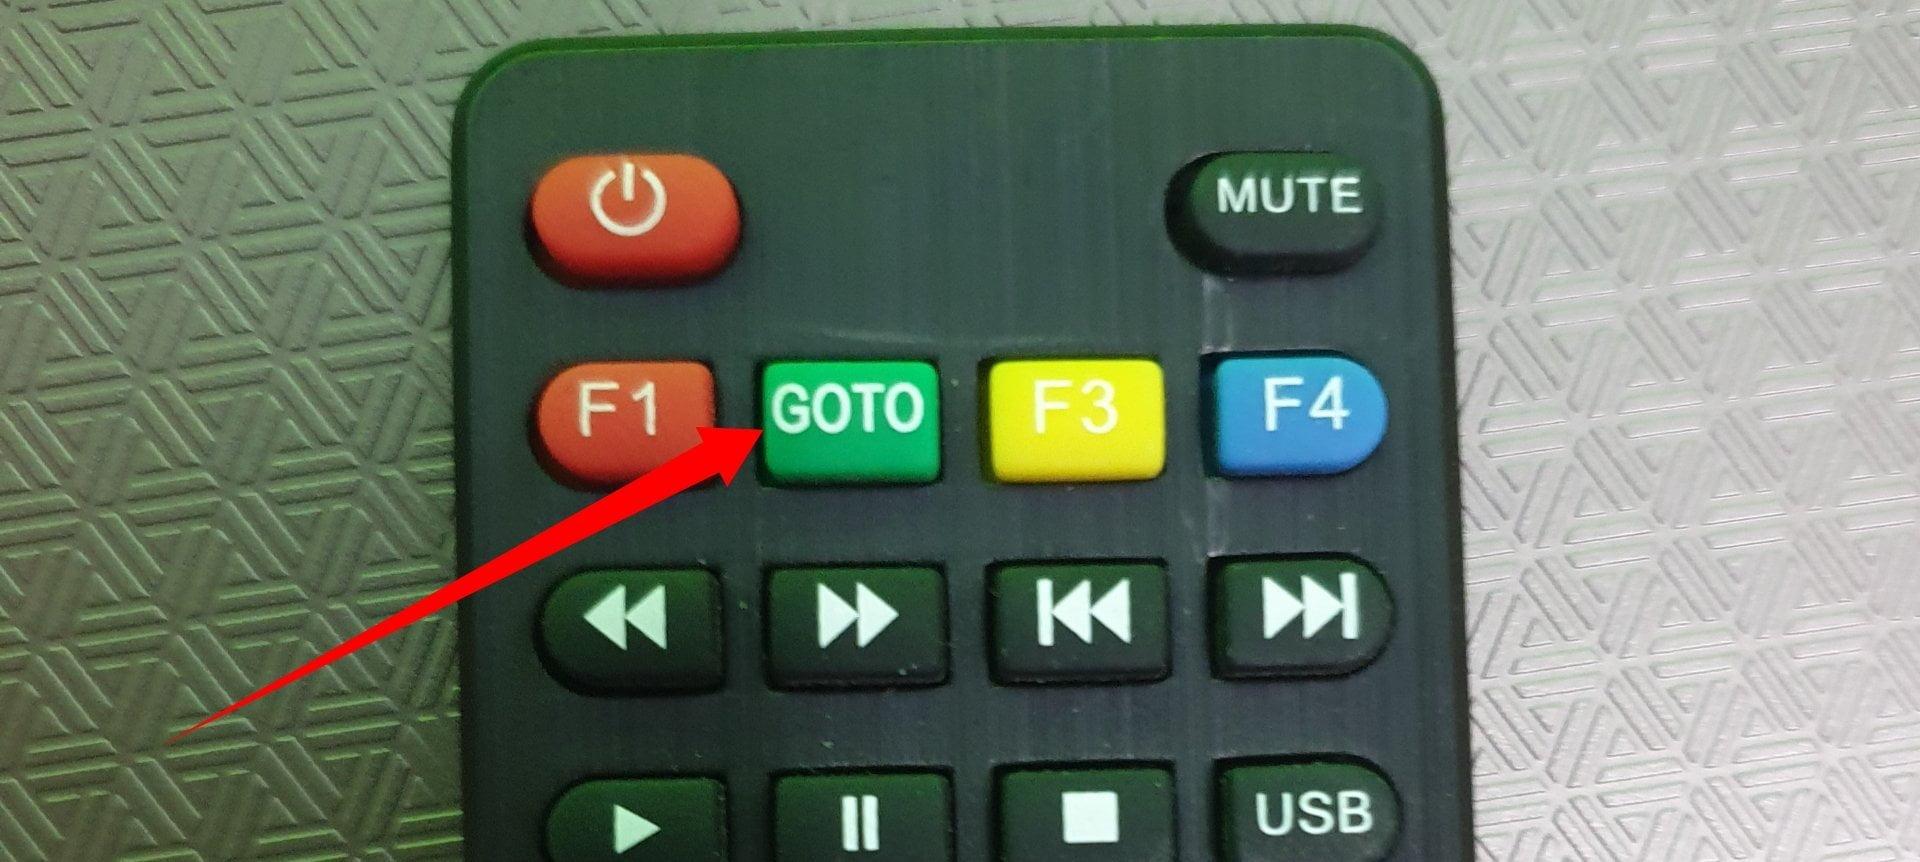 TV Varzish new Biss keys Fix TV Channel's shaadlife /tricks/guidlines